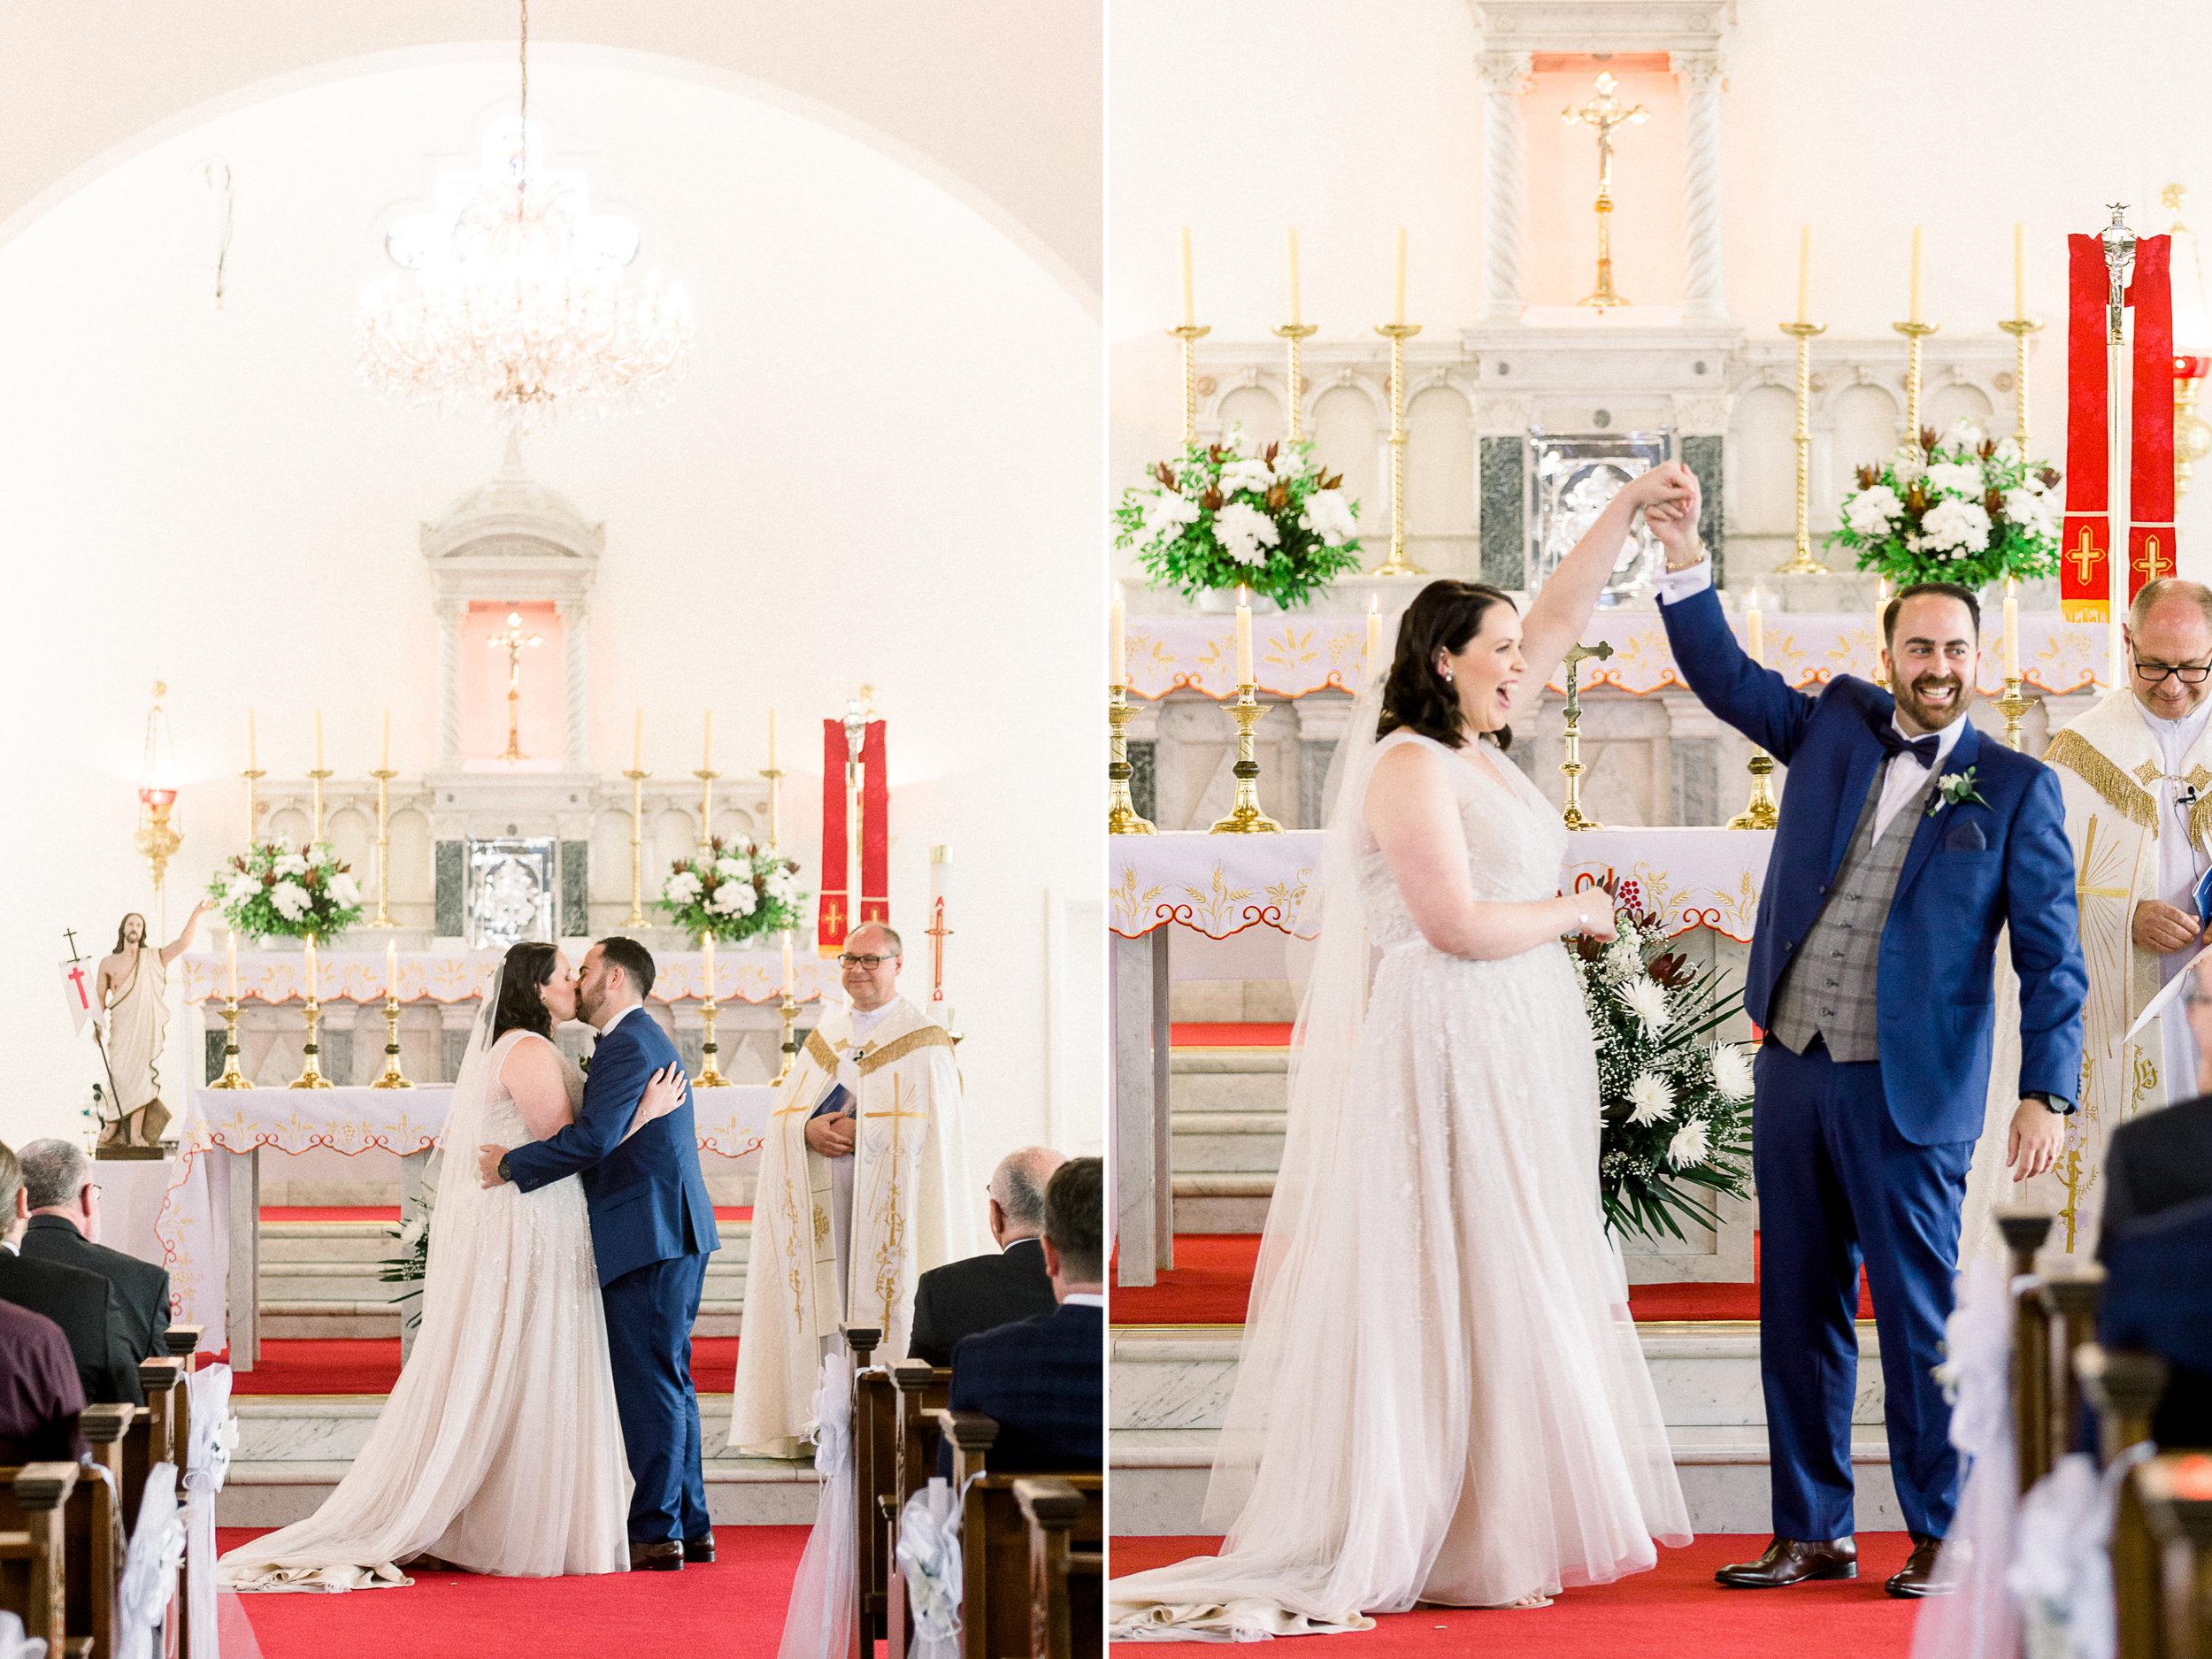 brisbane-city-wedding-church-ceremony-wedding-4.jpg